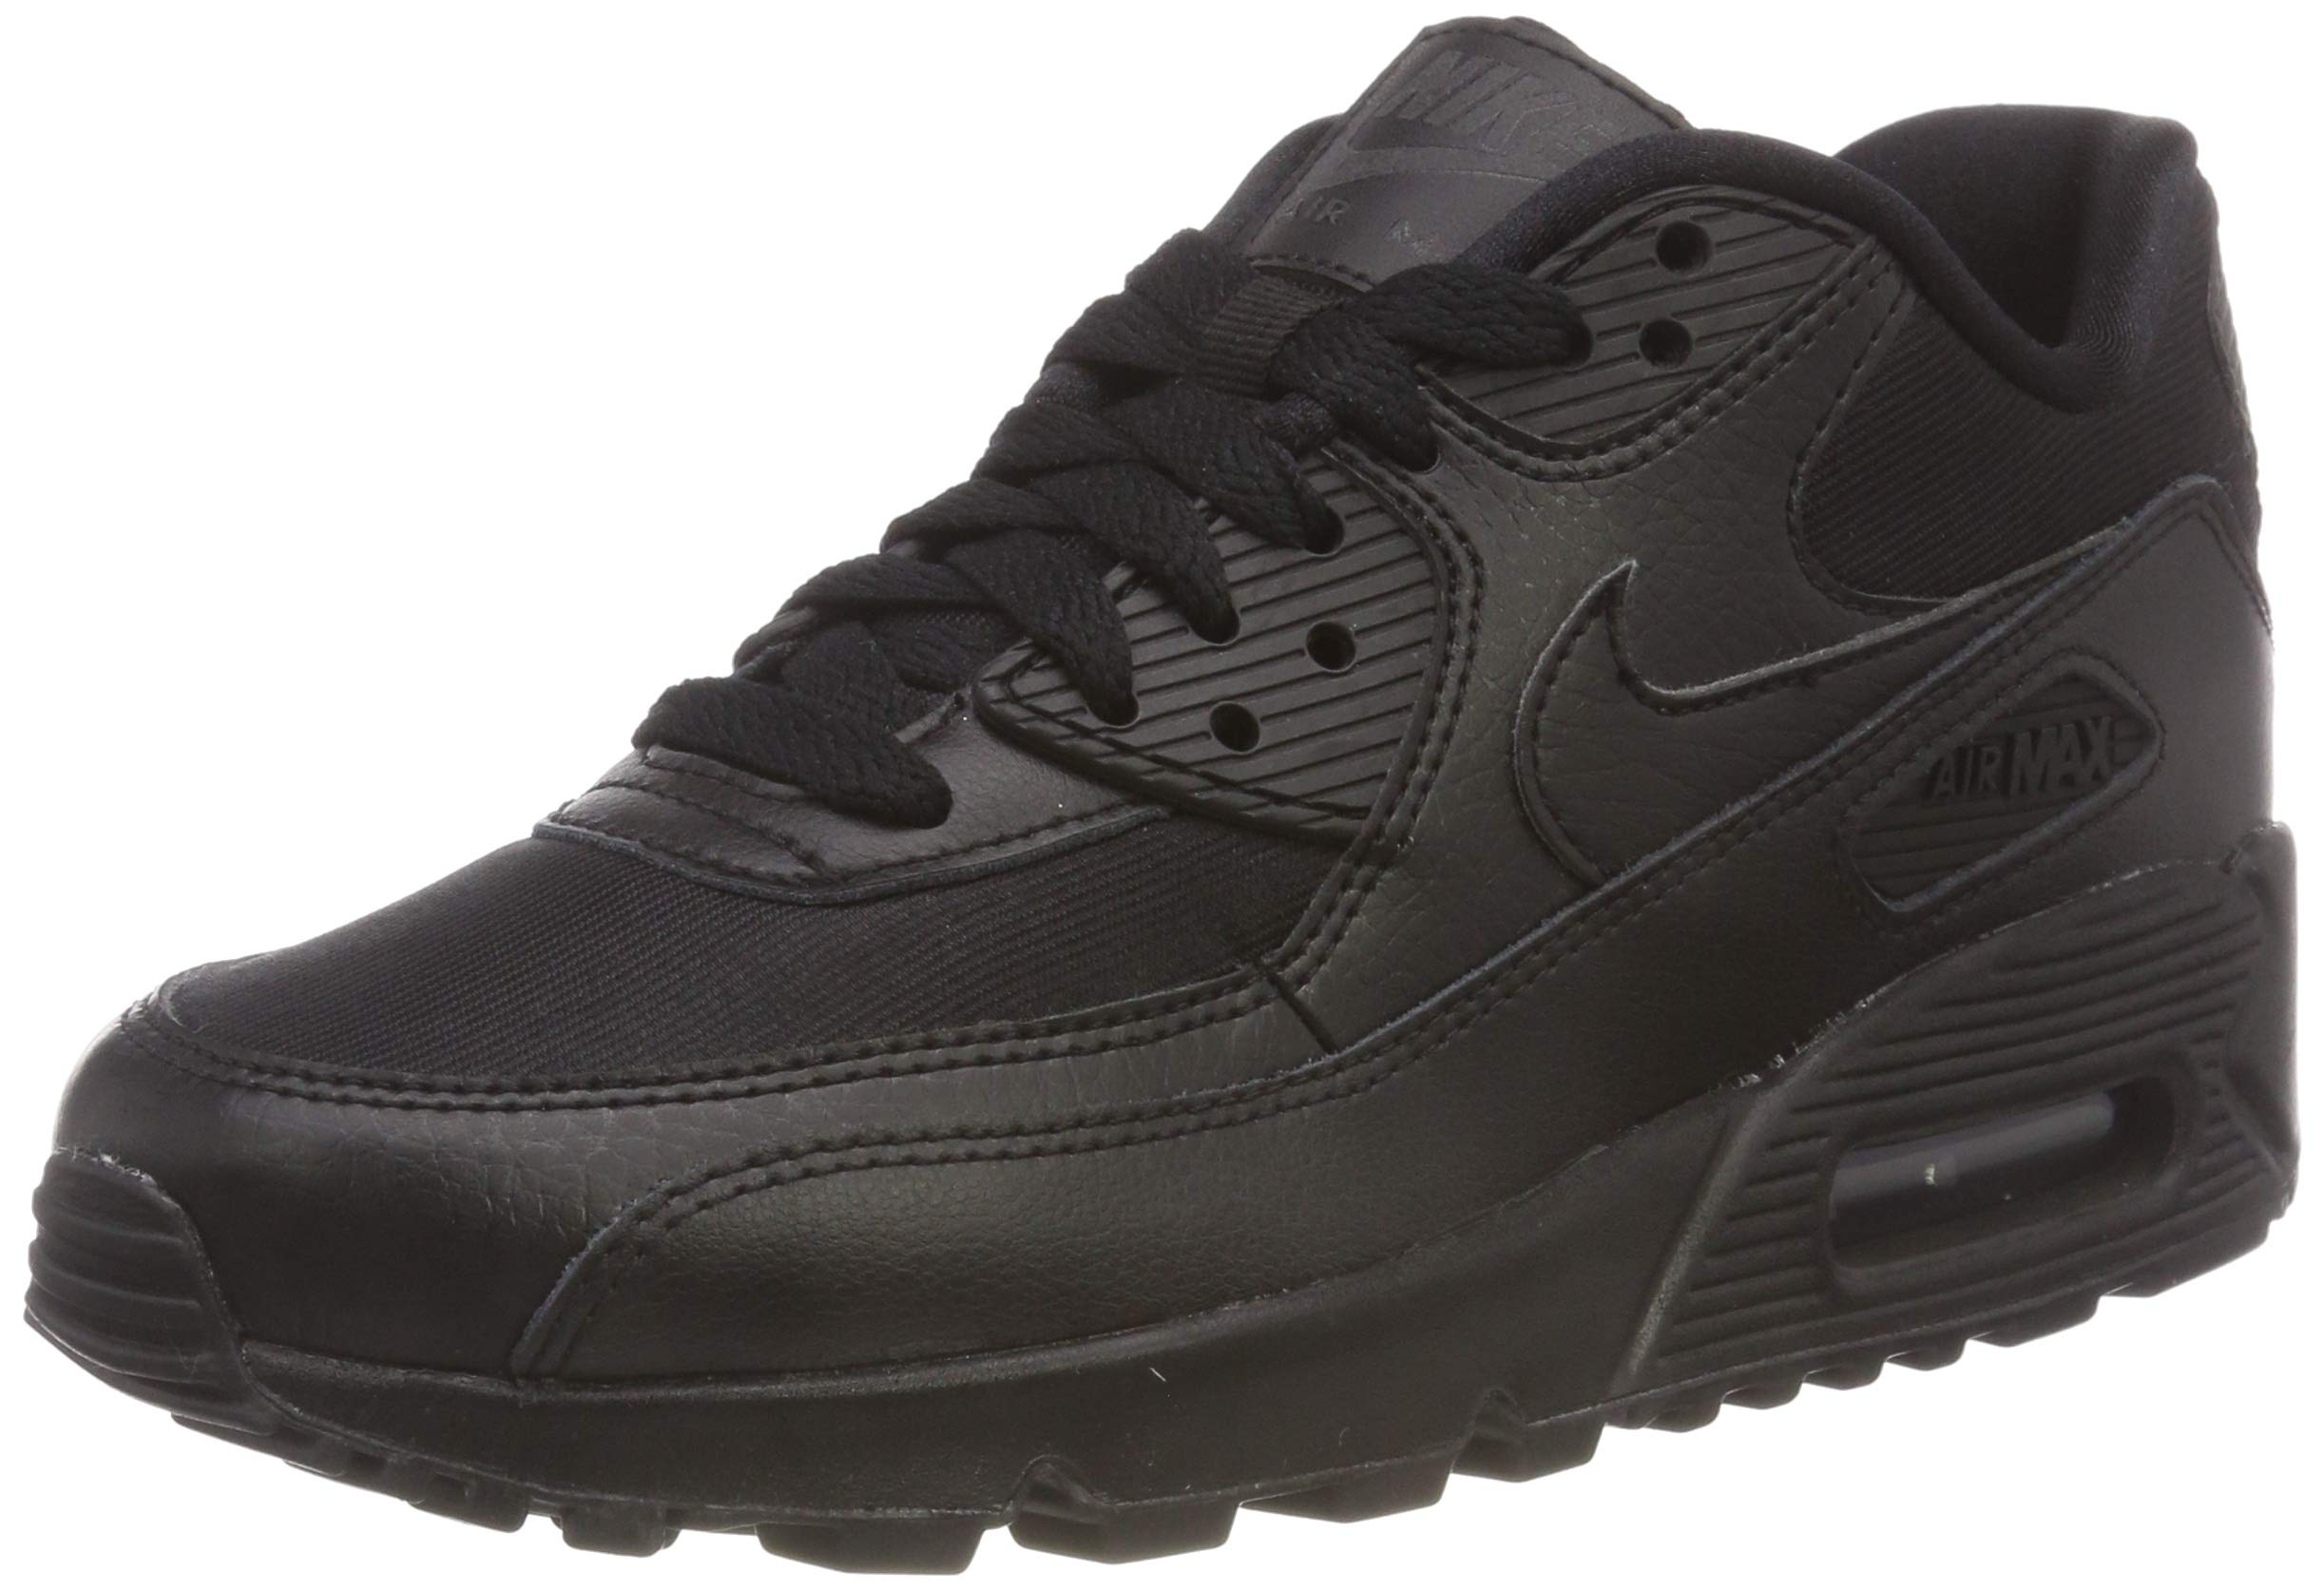 huge discount 871bb 74901 Galleon - NIKE Women s Air Max 90 Black Black Black Running Shoe 5.5 Women  US